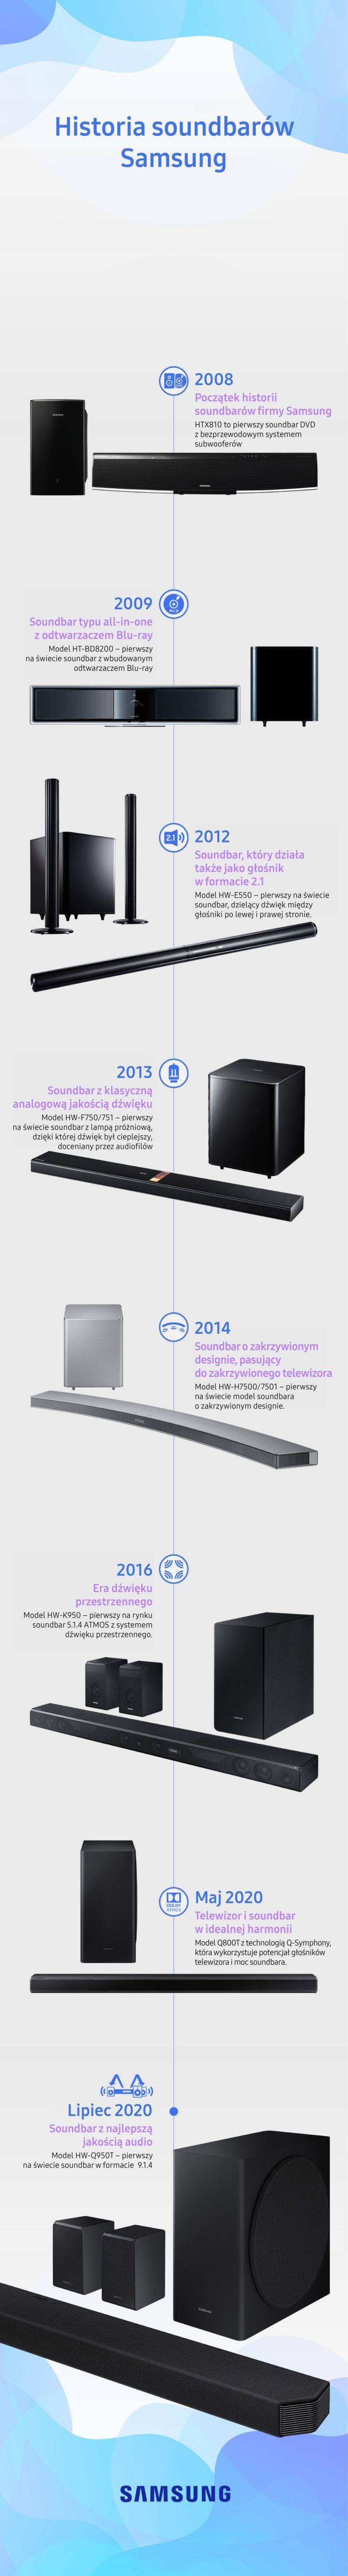 Infographic History of Samsung Soundbars 0902 PL 002 1